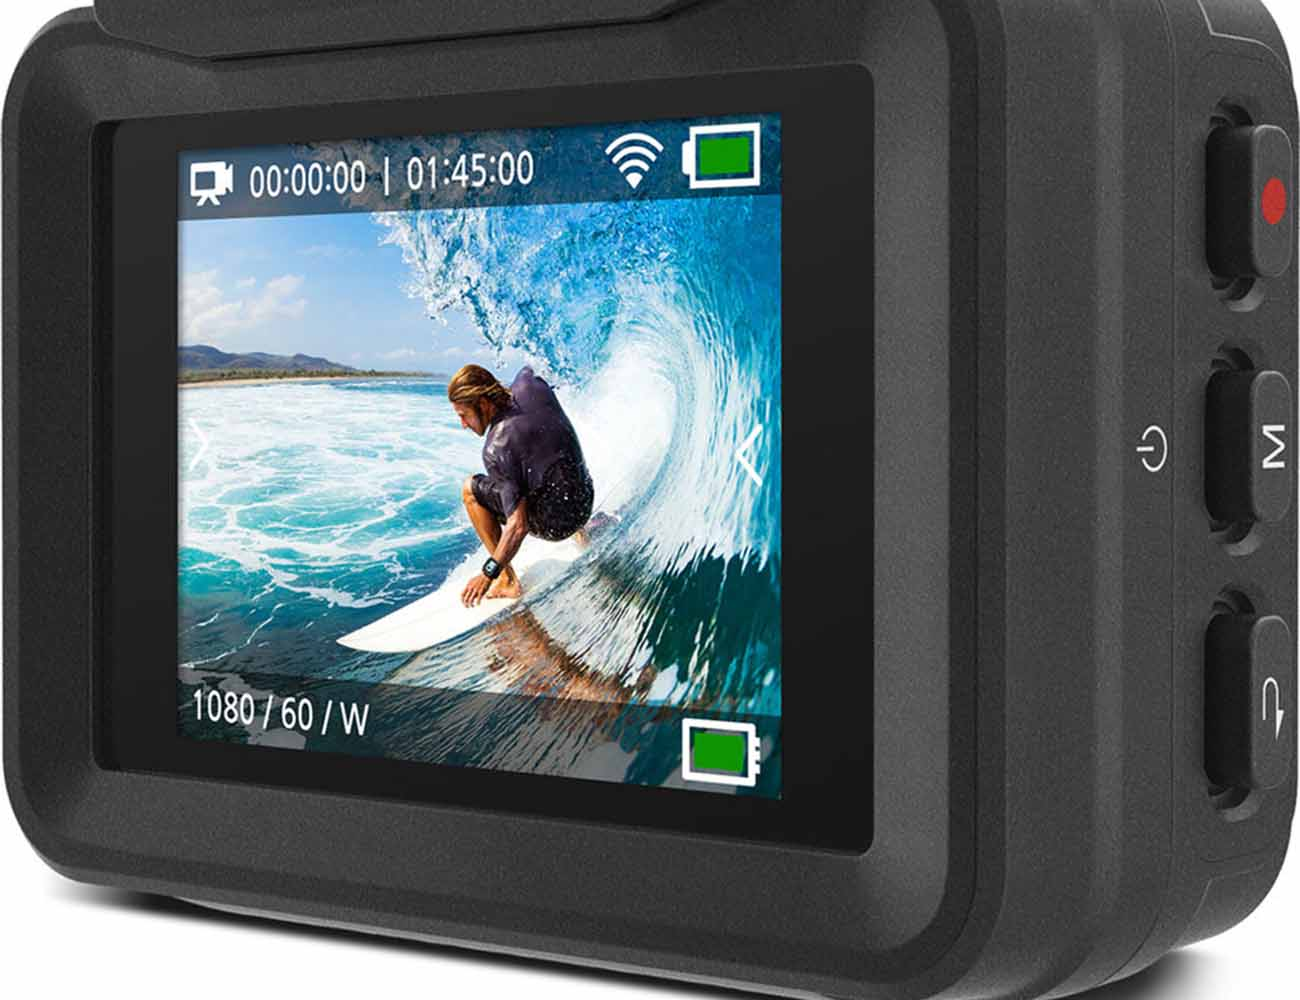 Removu Wi-Fi Remote Viewer for GoPro